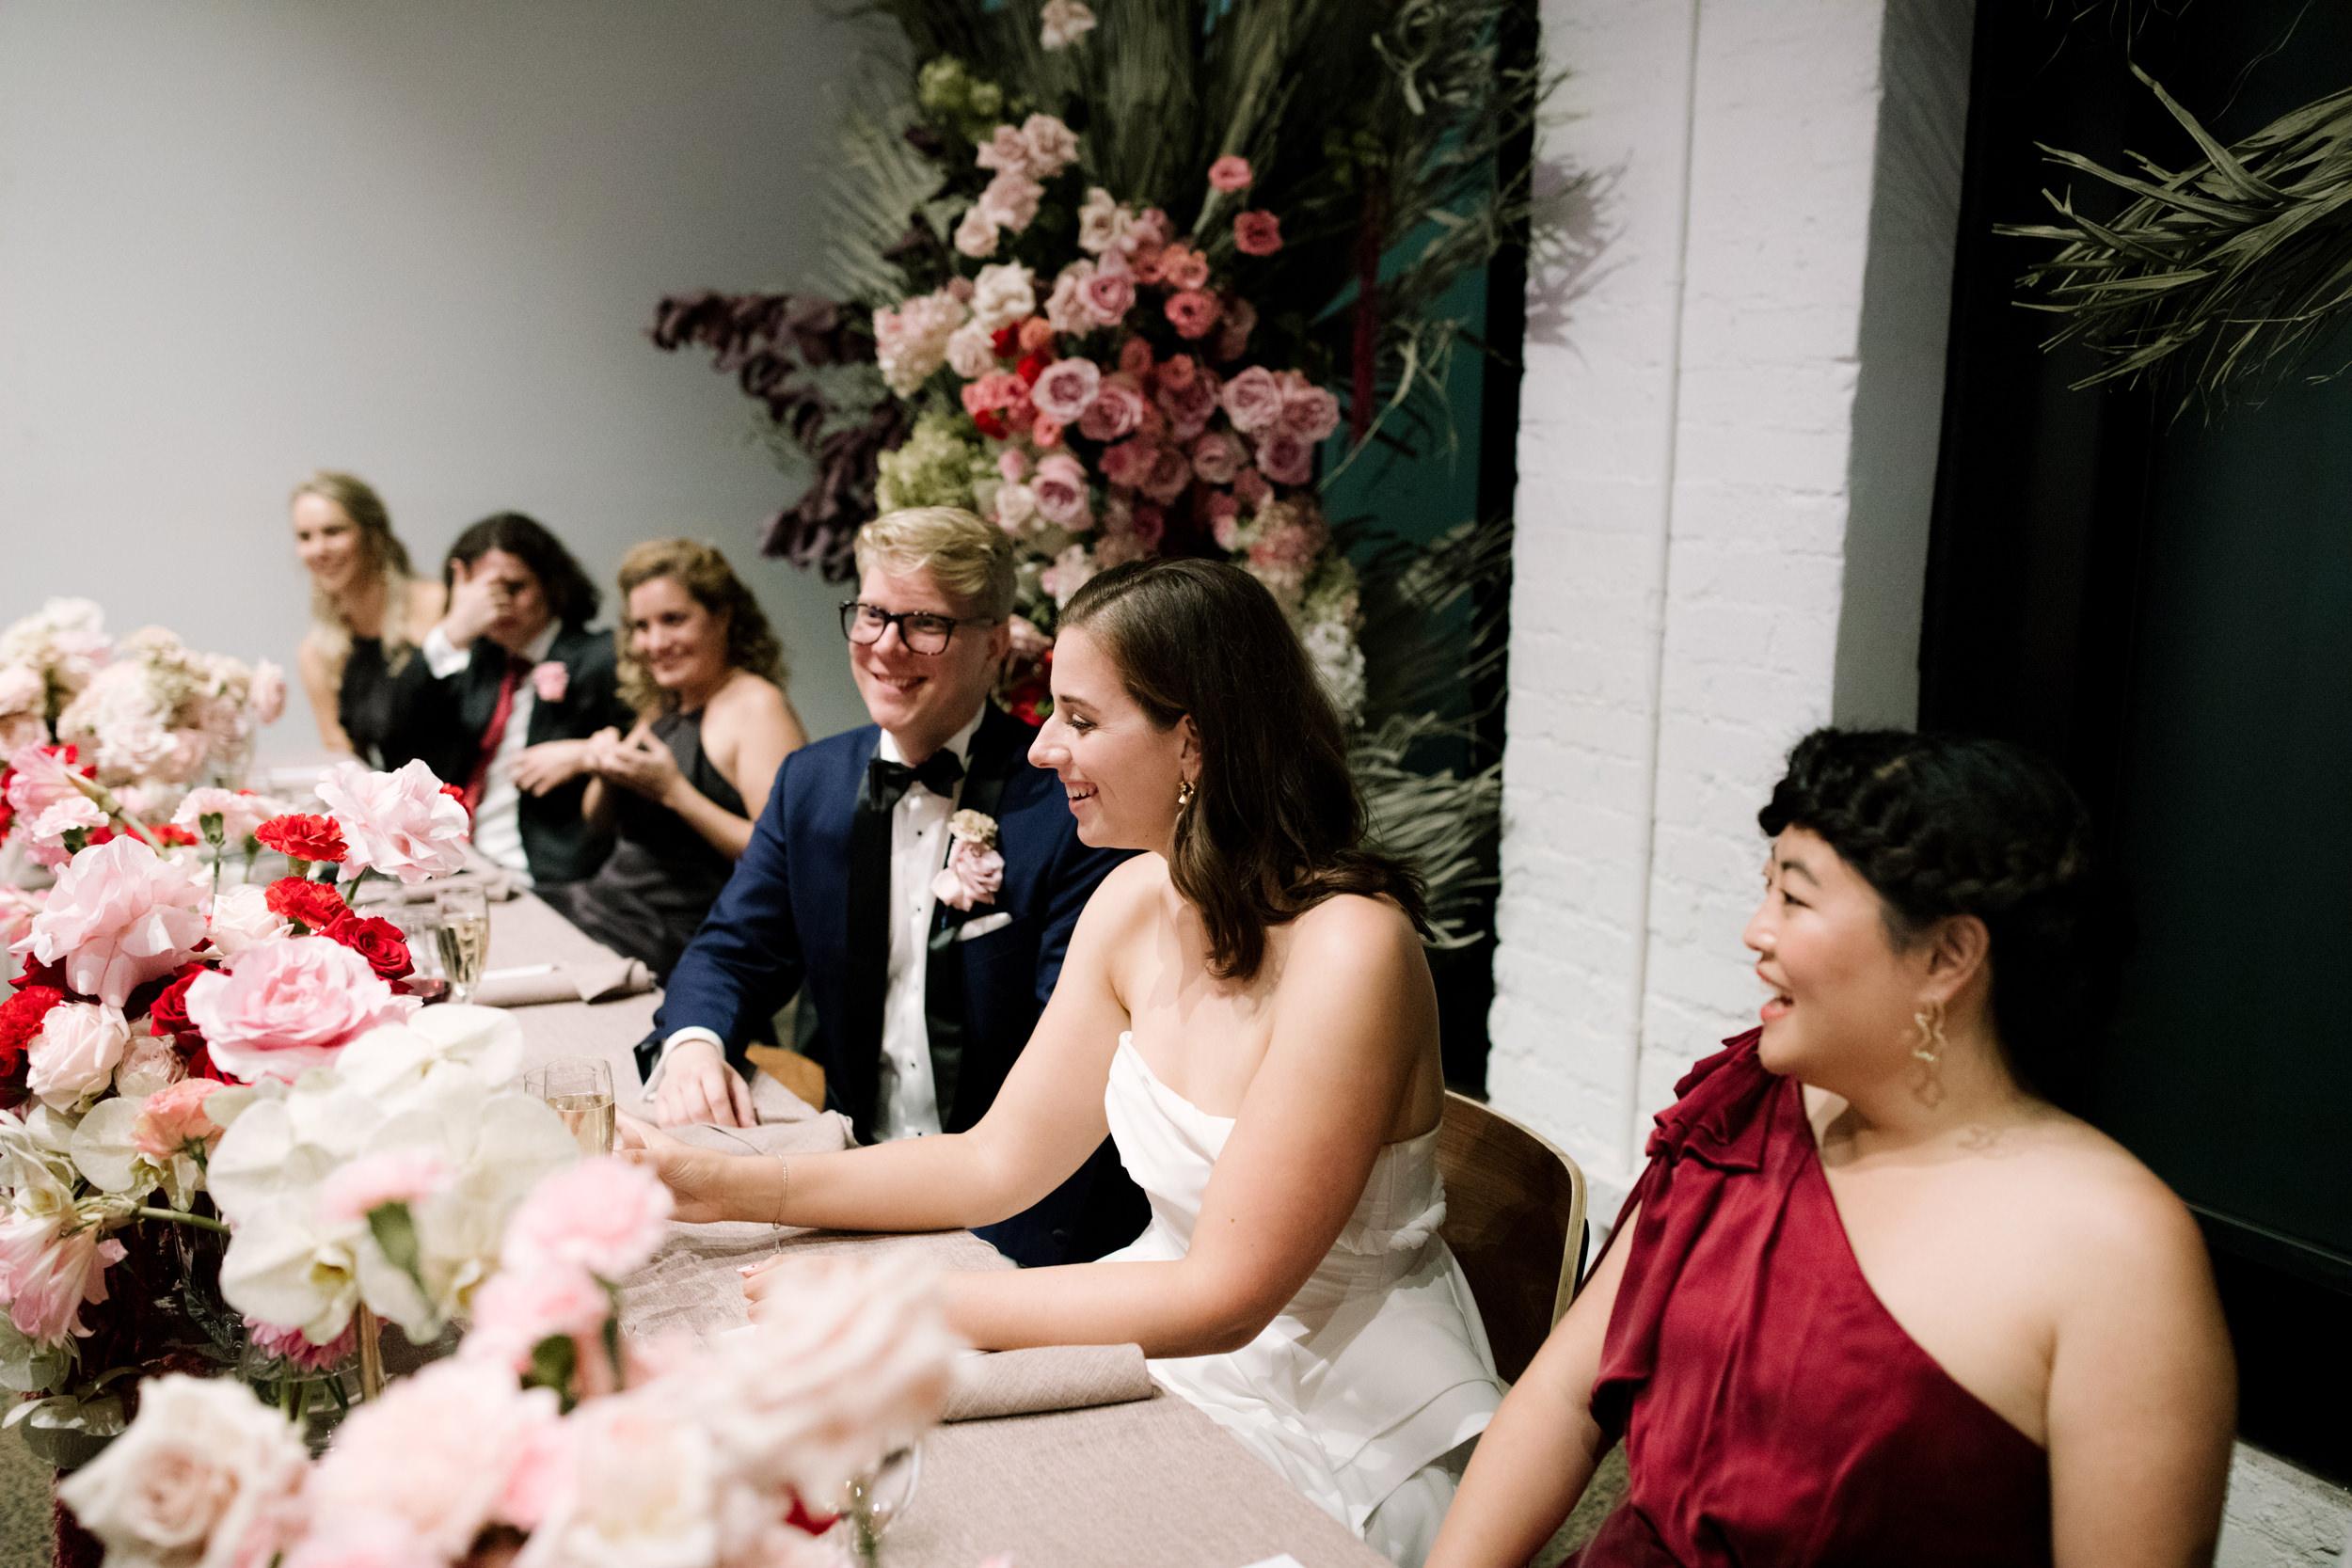 I-Got-You-Babe-Weddings-Tahlia&Mitch-Butler-Lane-Wedding0302.JPG